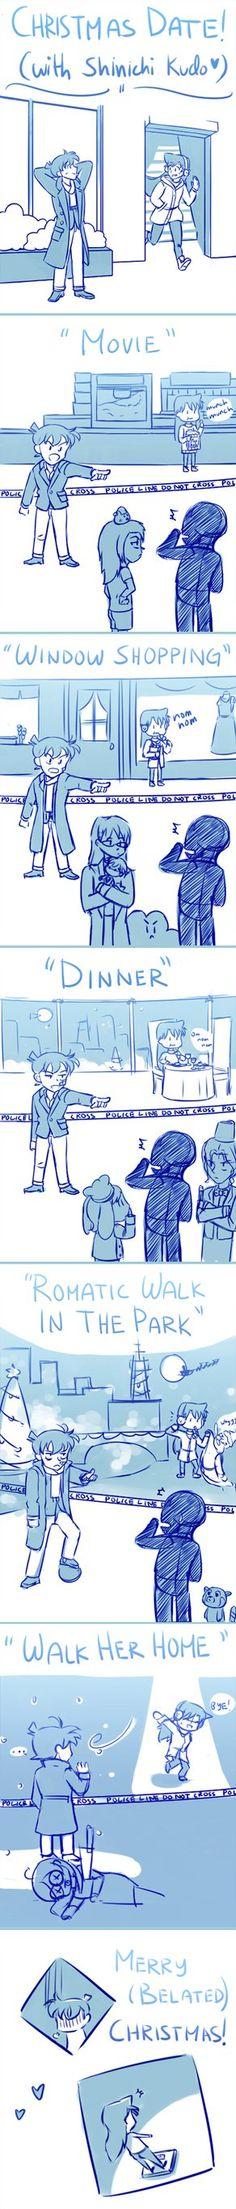 Christmas Date with Shinichi xD (( Kinda sums up da show )) Magic Kaito, Detective Conan Ran, Best Anime Shows, Gosho Aoyama, Kaito Kid, Detektif Conan, Cute Girl Wallpaper, Kaichou Wa Maid Sama, Case Closed